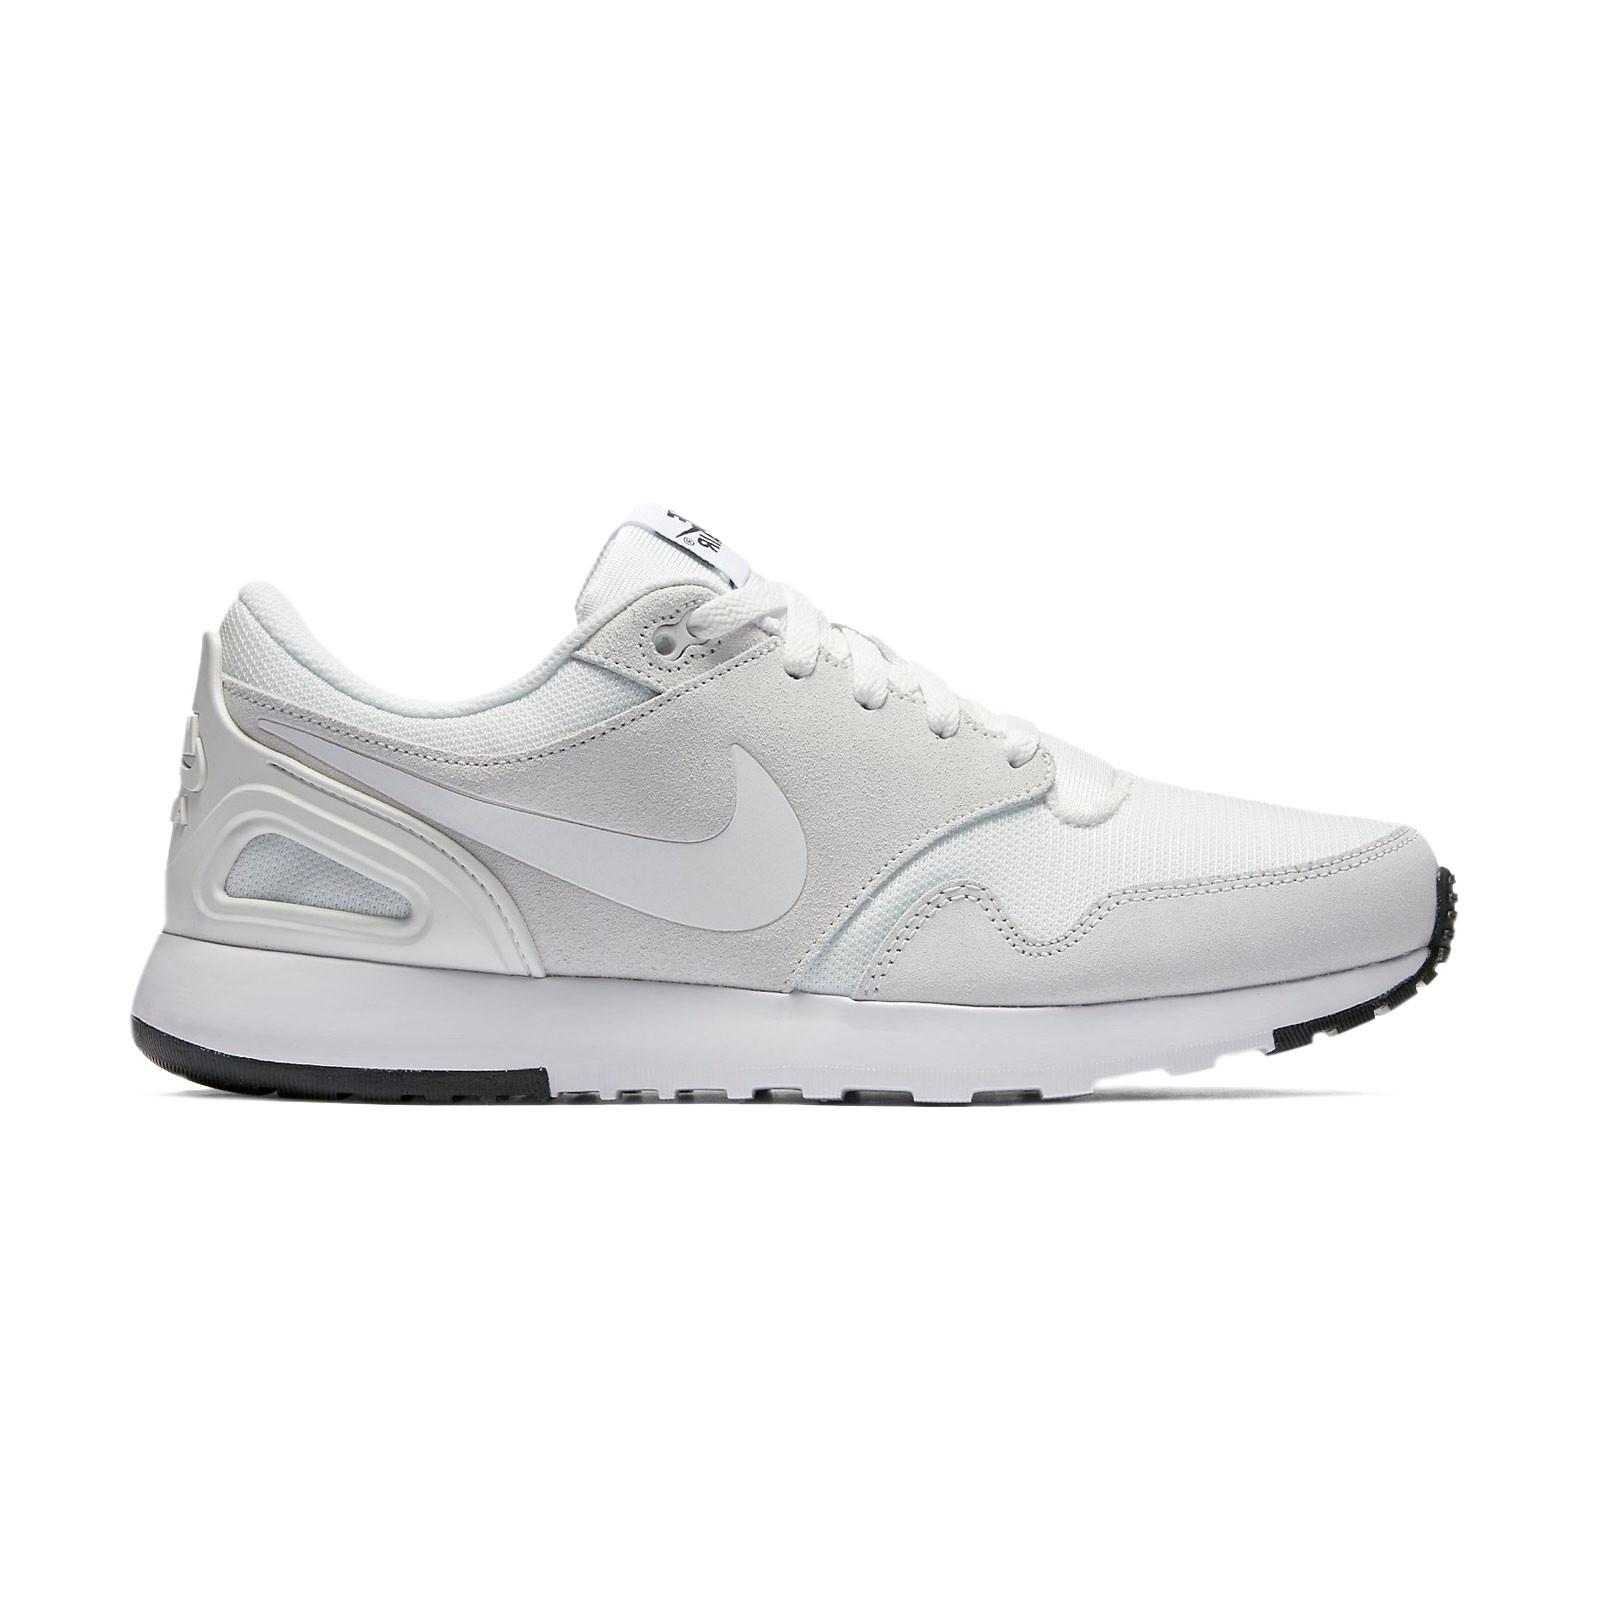 estéreo impacto selva  Zapatillas Nike Air Vibenna Sportswear para Hombre   Runa Store